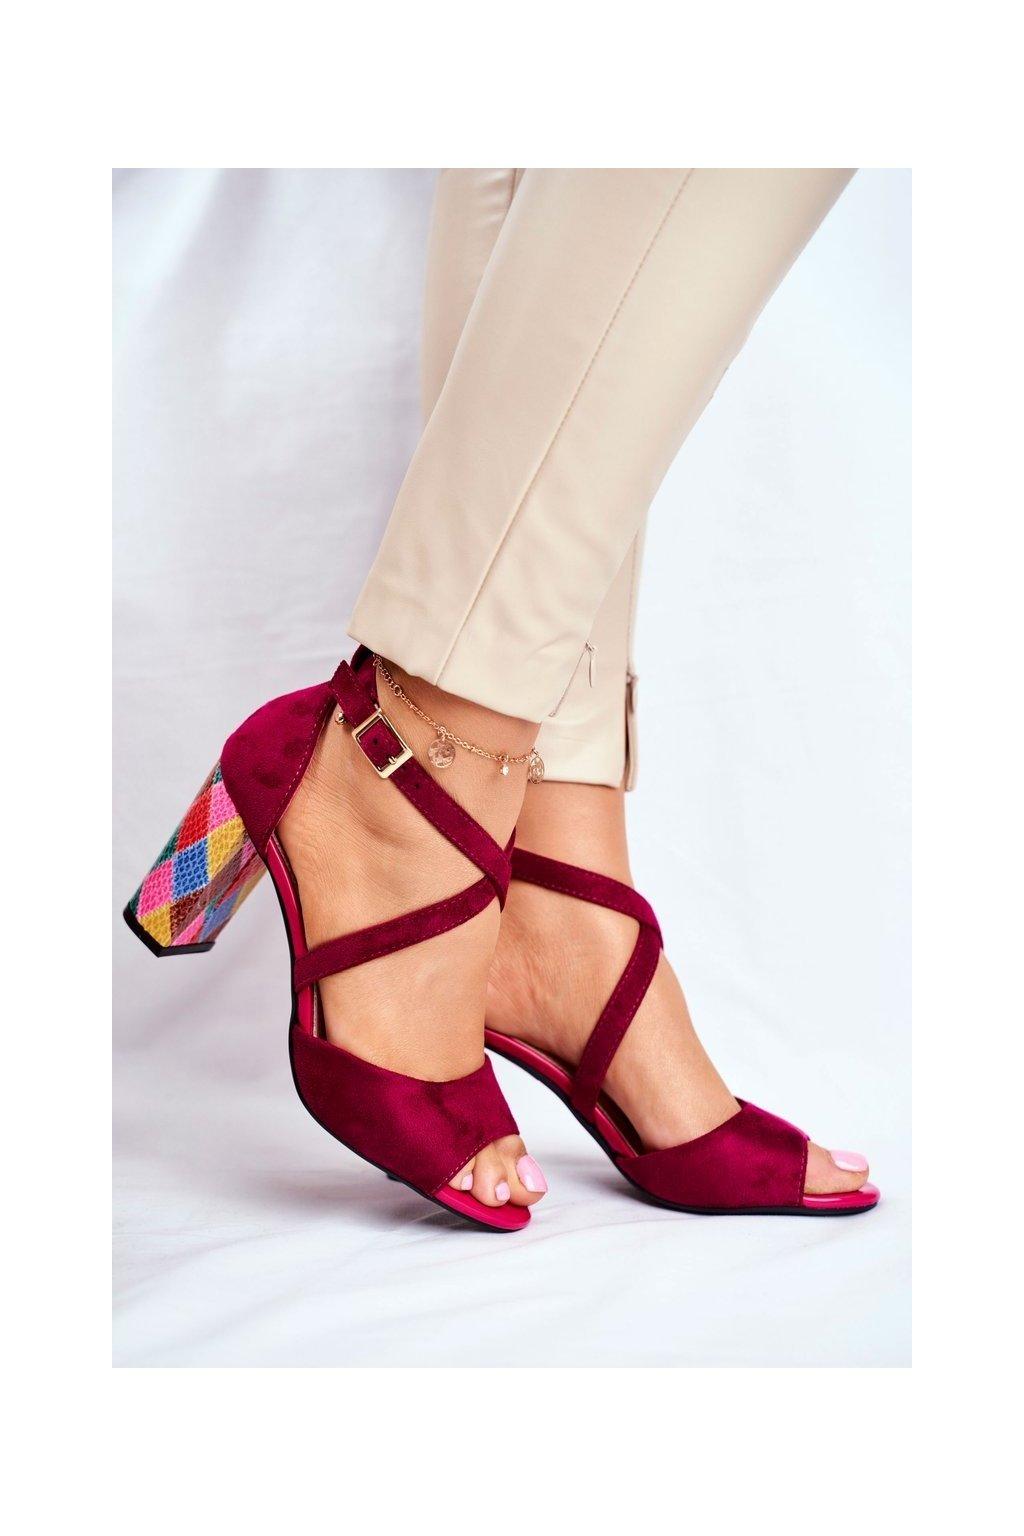 Dámske sandále na podpätku farba ružová NJSK SK865 FUCHSIA MIC